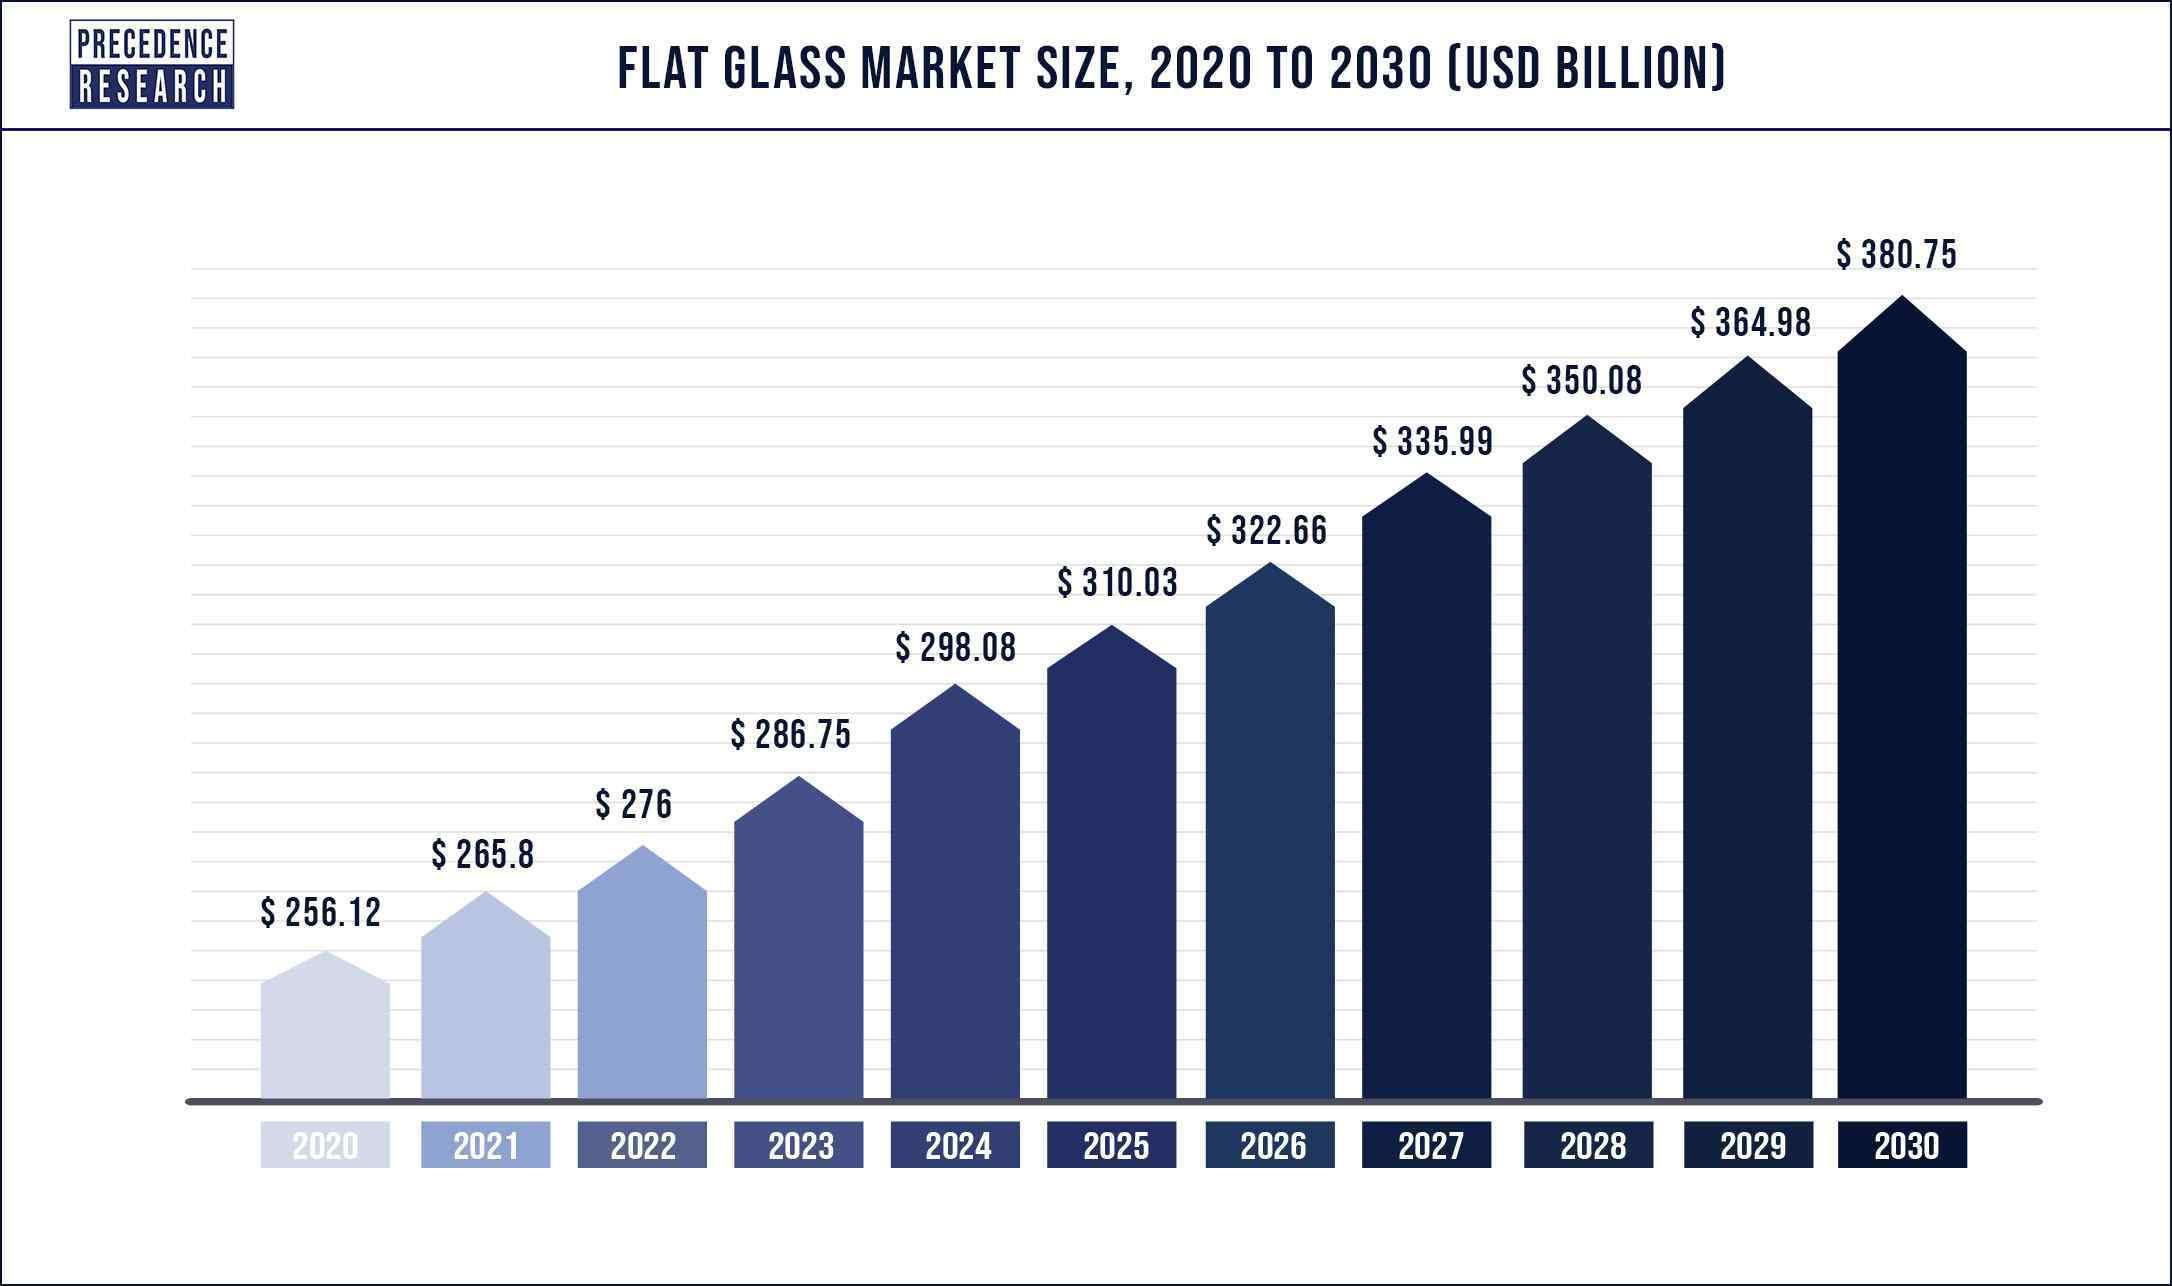 Flat Glass Market Size 2020 to 2030